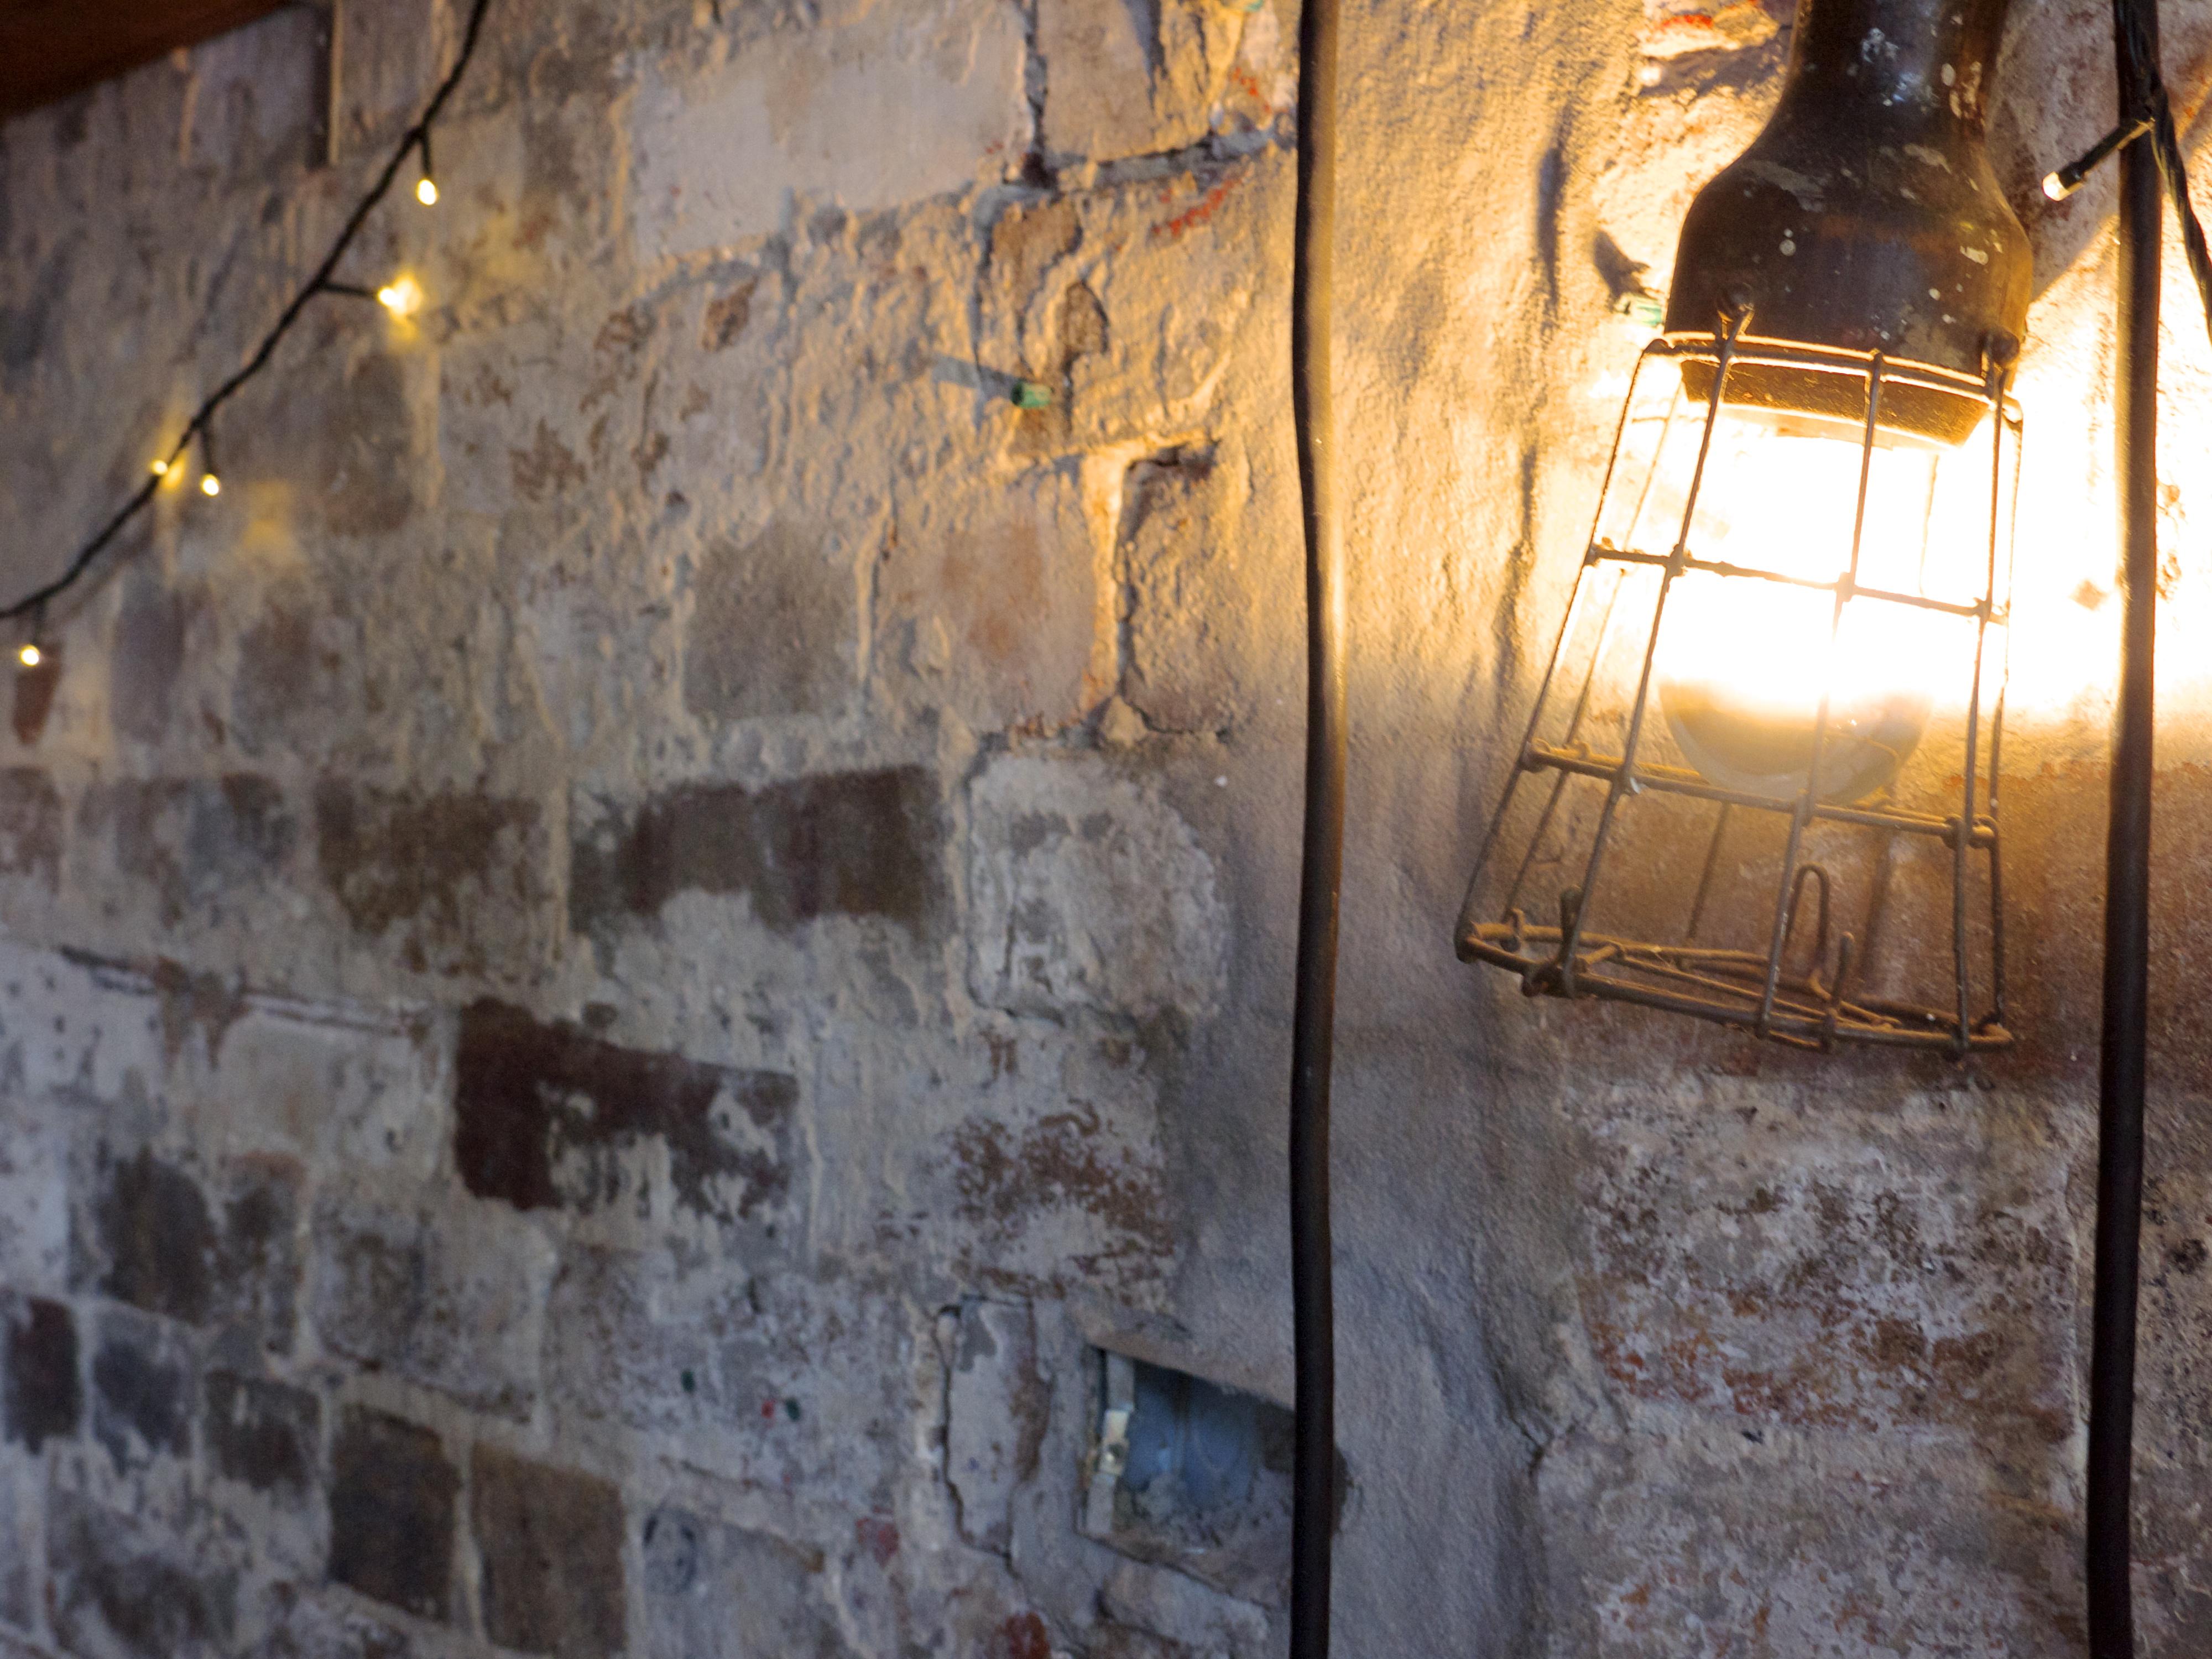 Exposed Brick and Industrial Light - Arcadia Liquors in Redfern